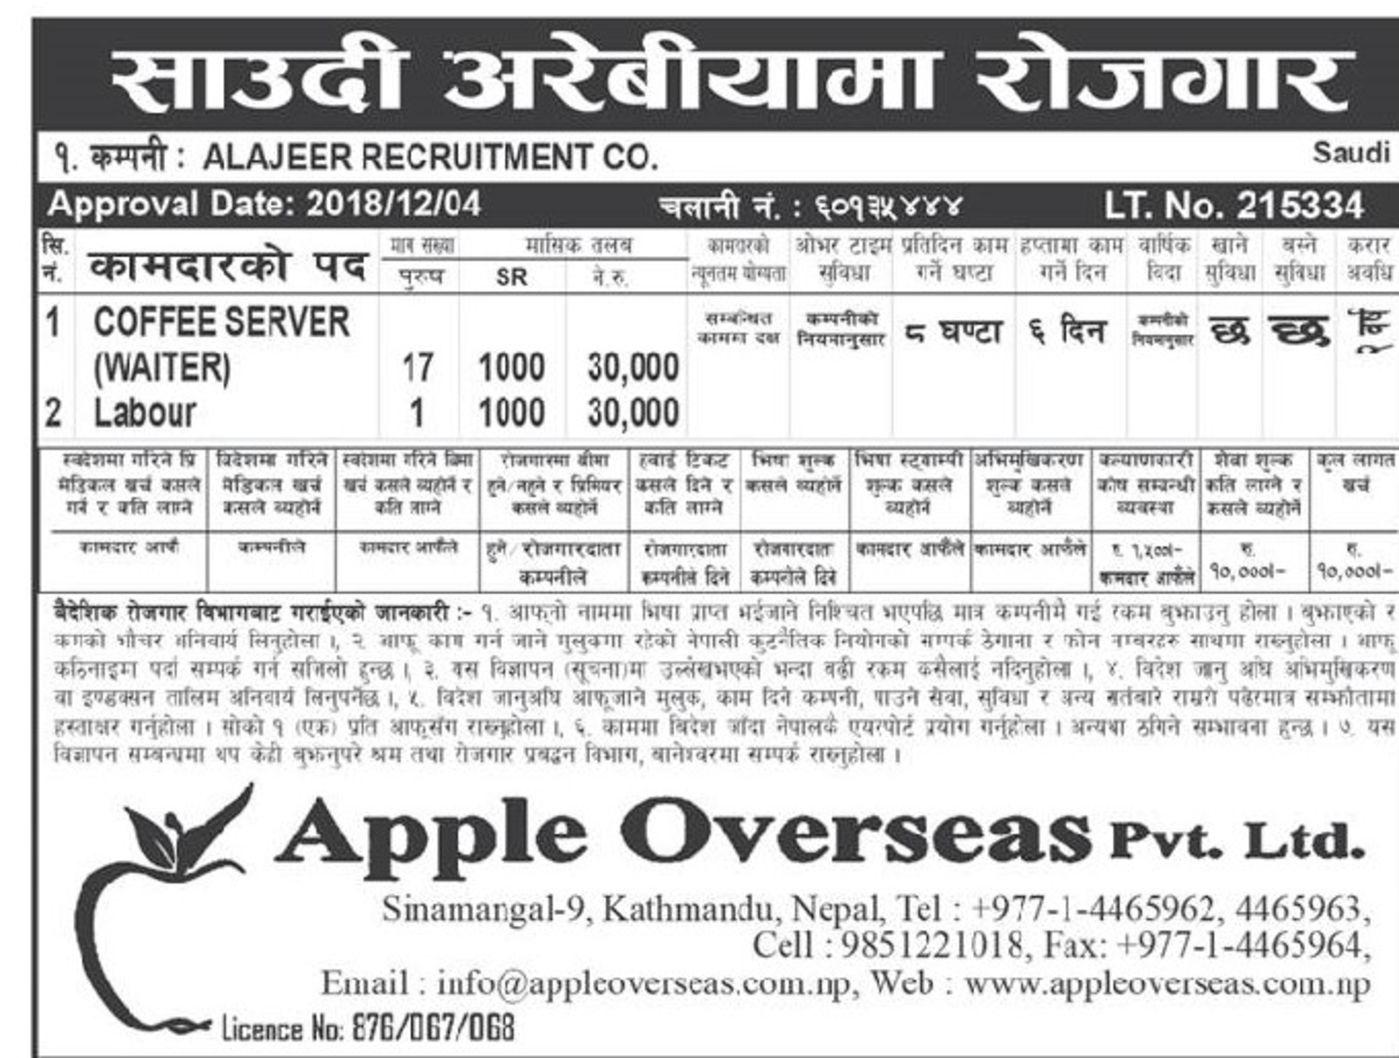 Jobs Nepal - Vacancy - Waiter ,Labor,- Applo Overseas Pvt